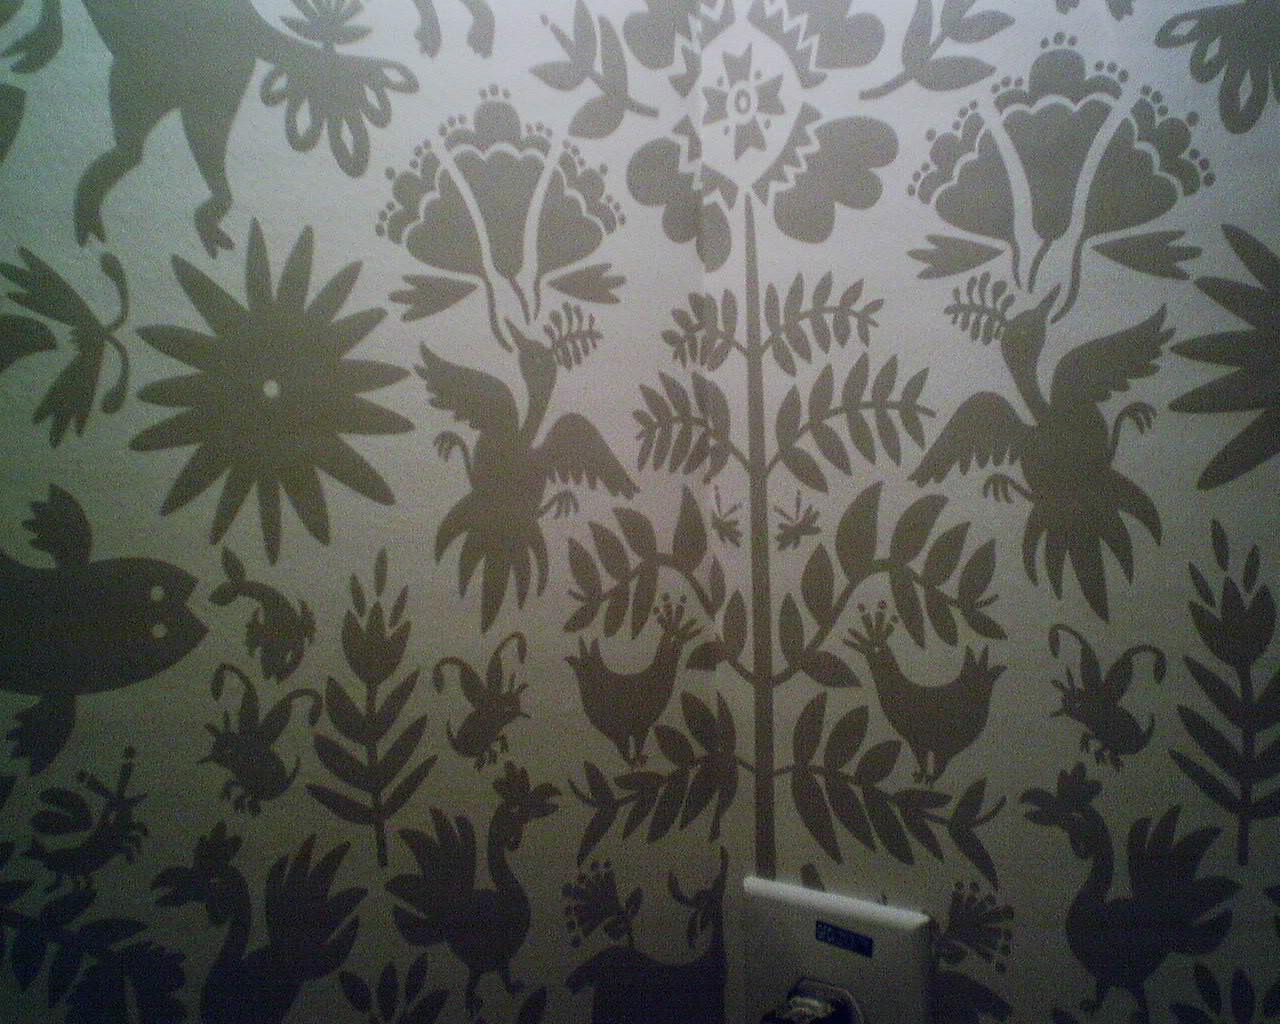 Good Wallpaper Home Screen Pineapple - dsc00075  Snapshot_128716.jpg